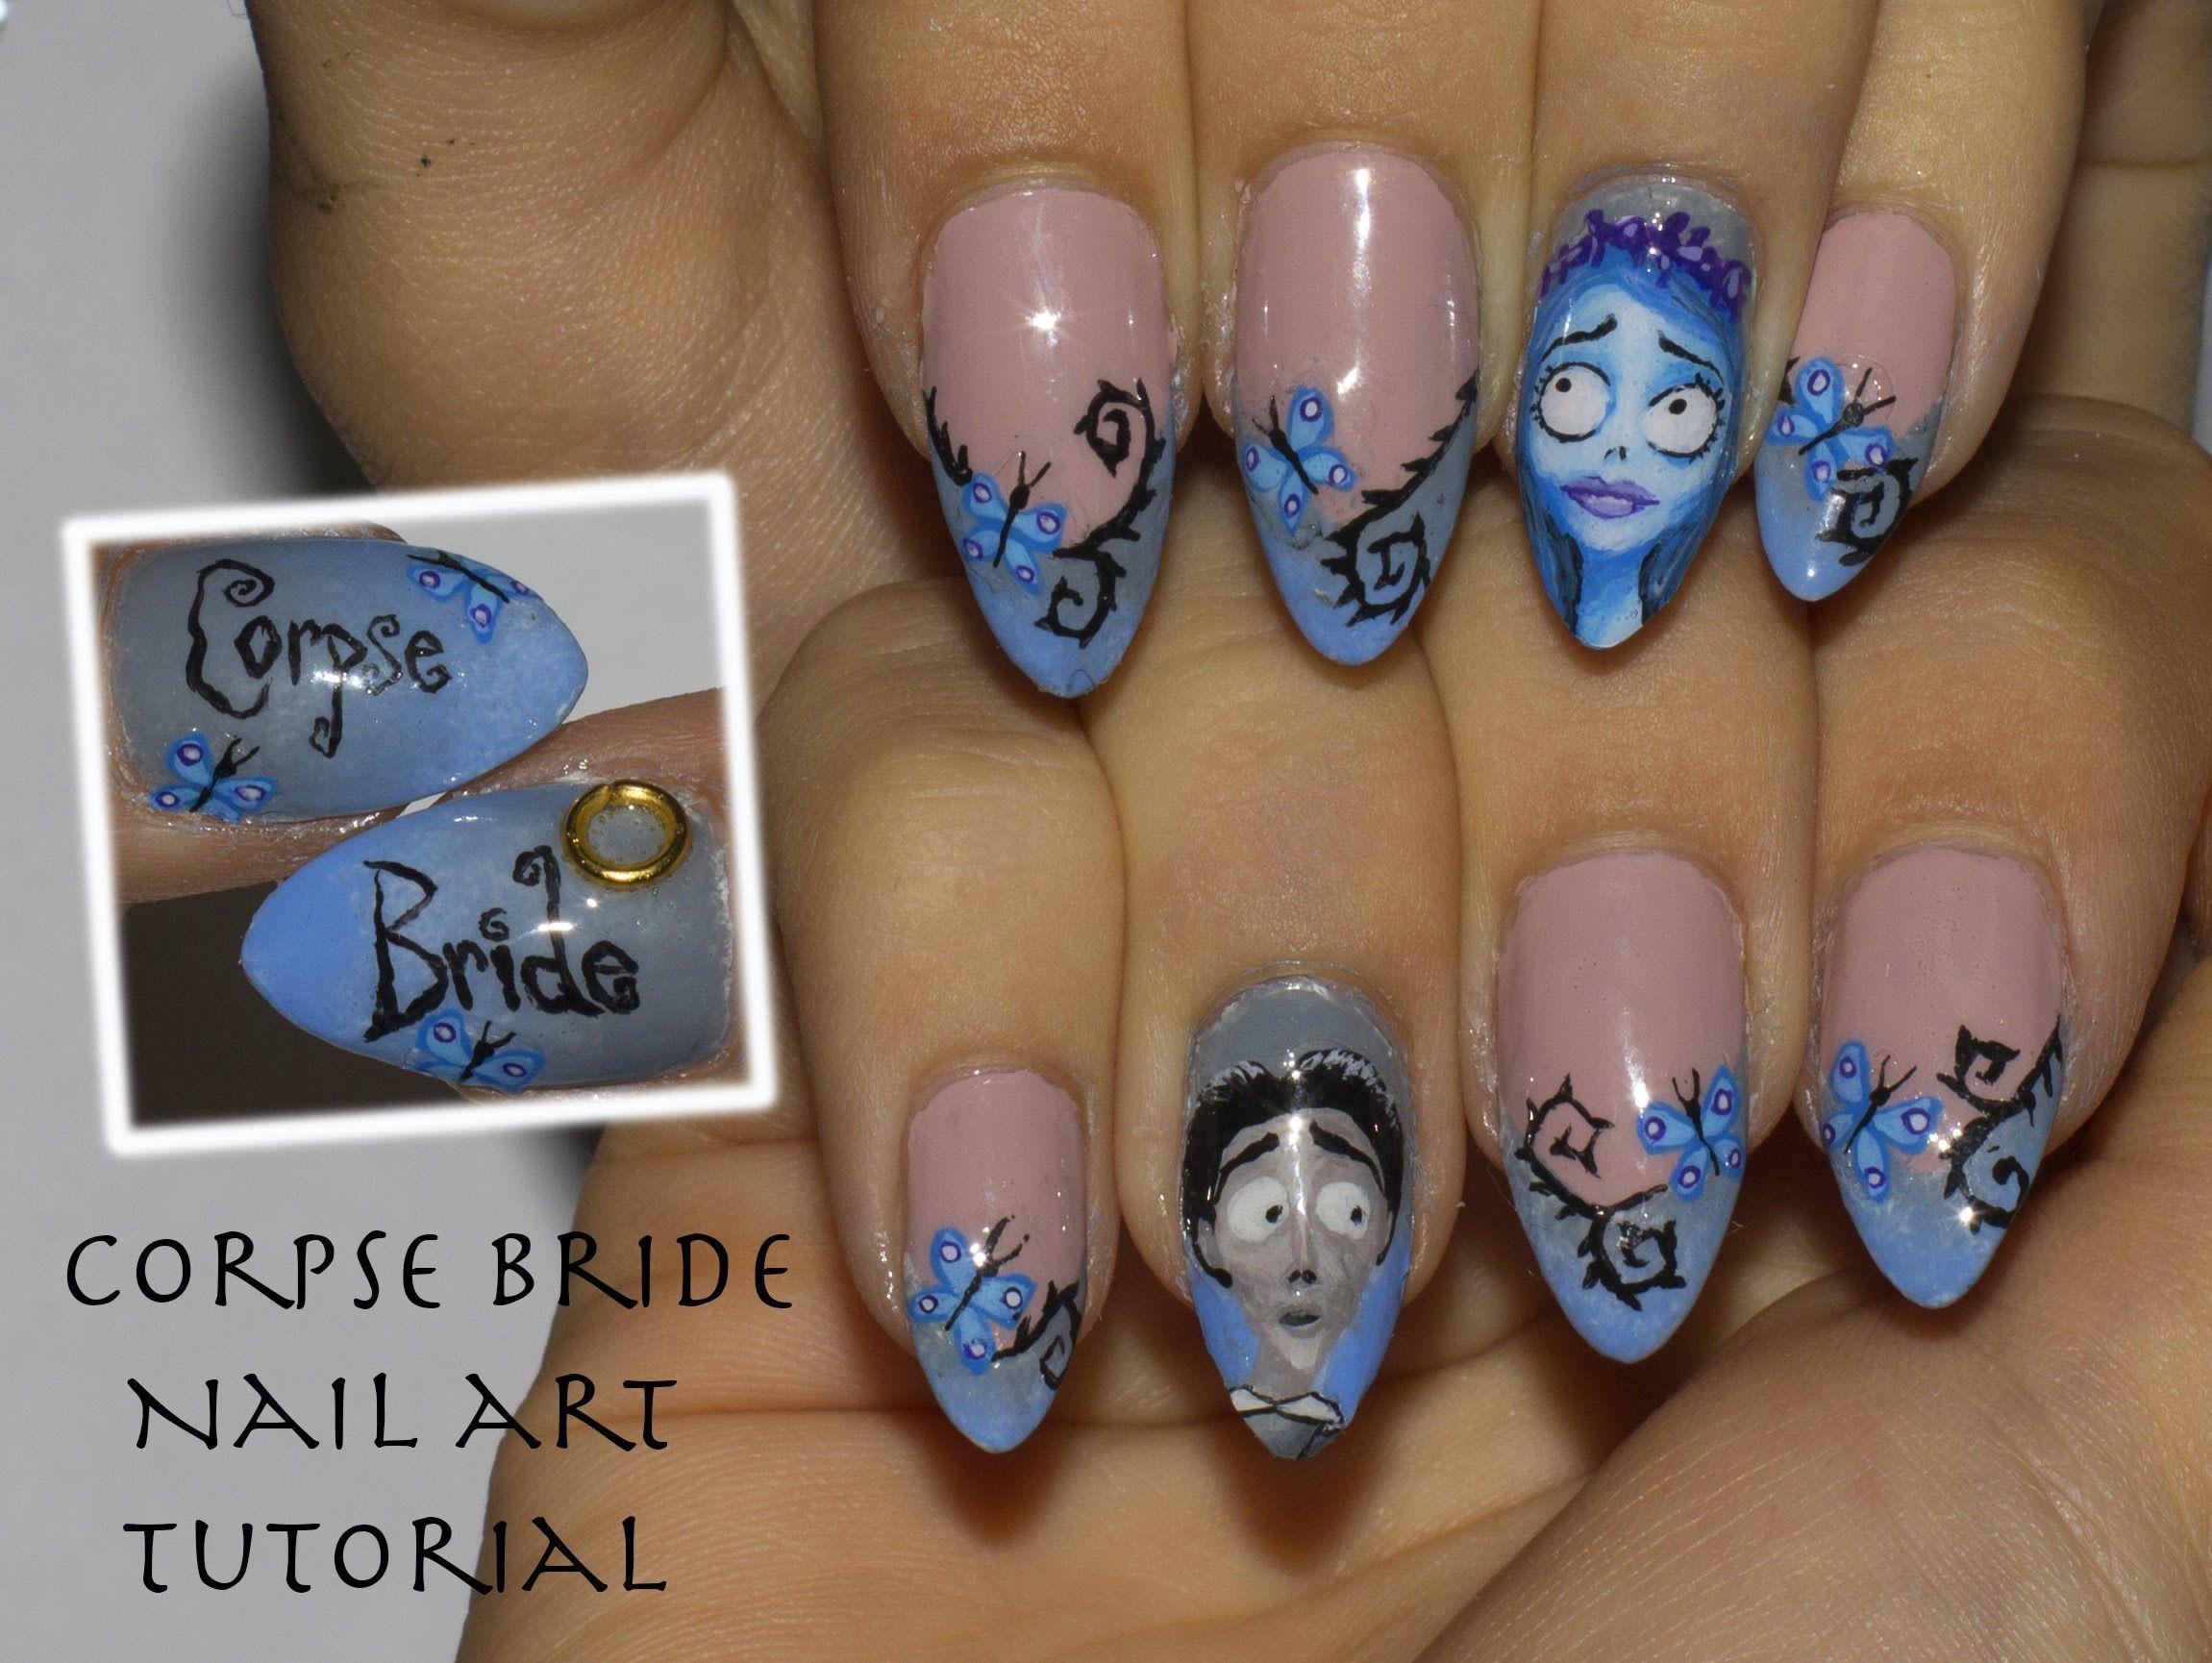 tim burton's corpse bride halloween nail art tutorial + how to make